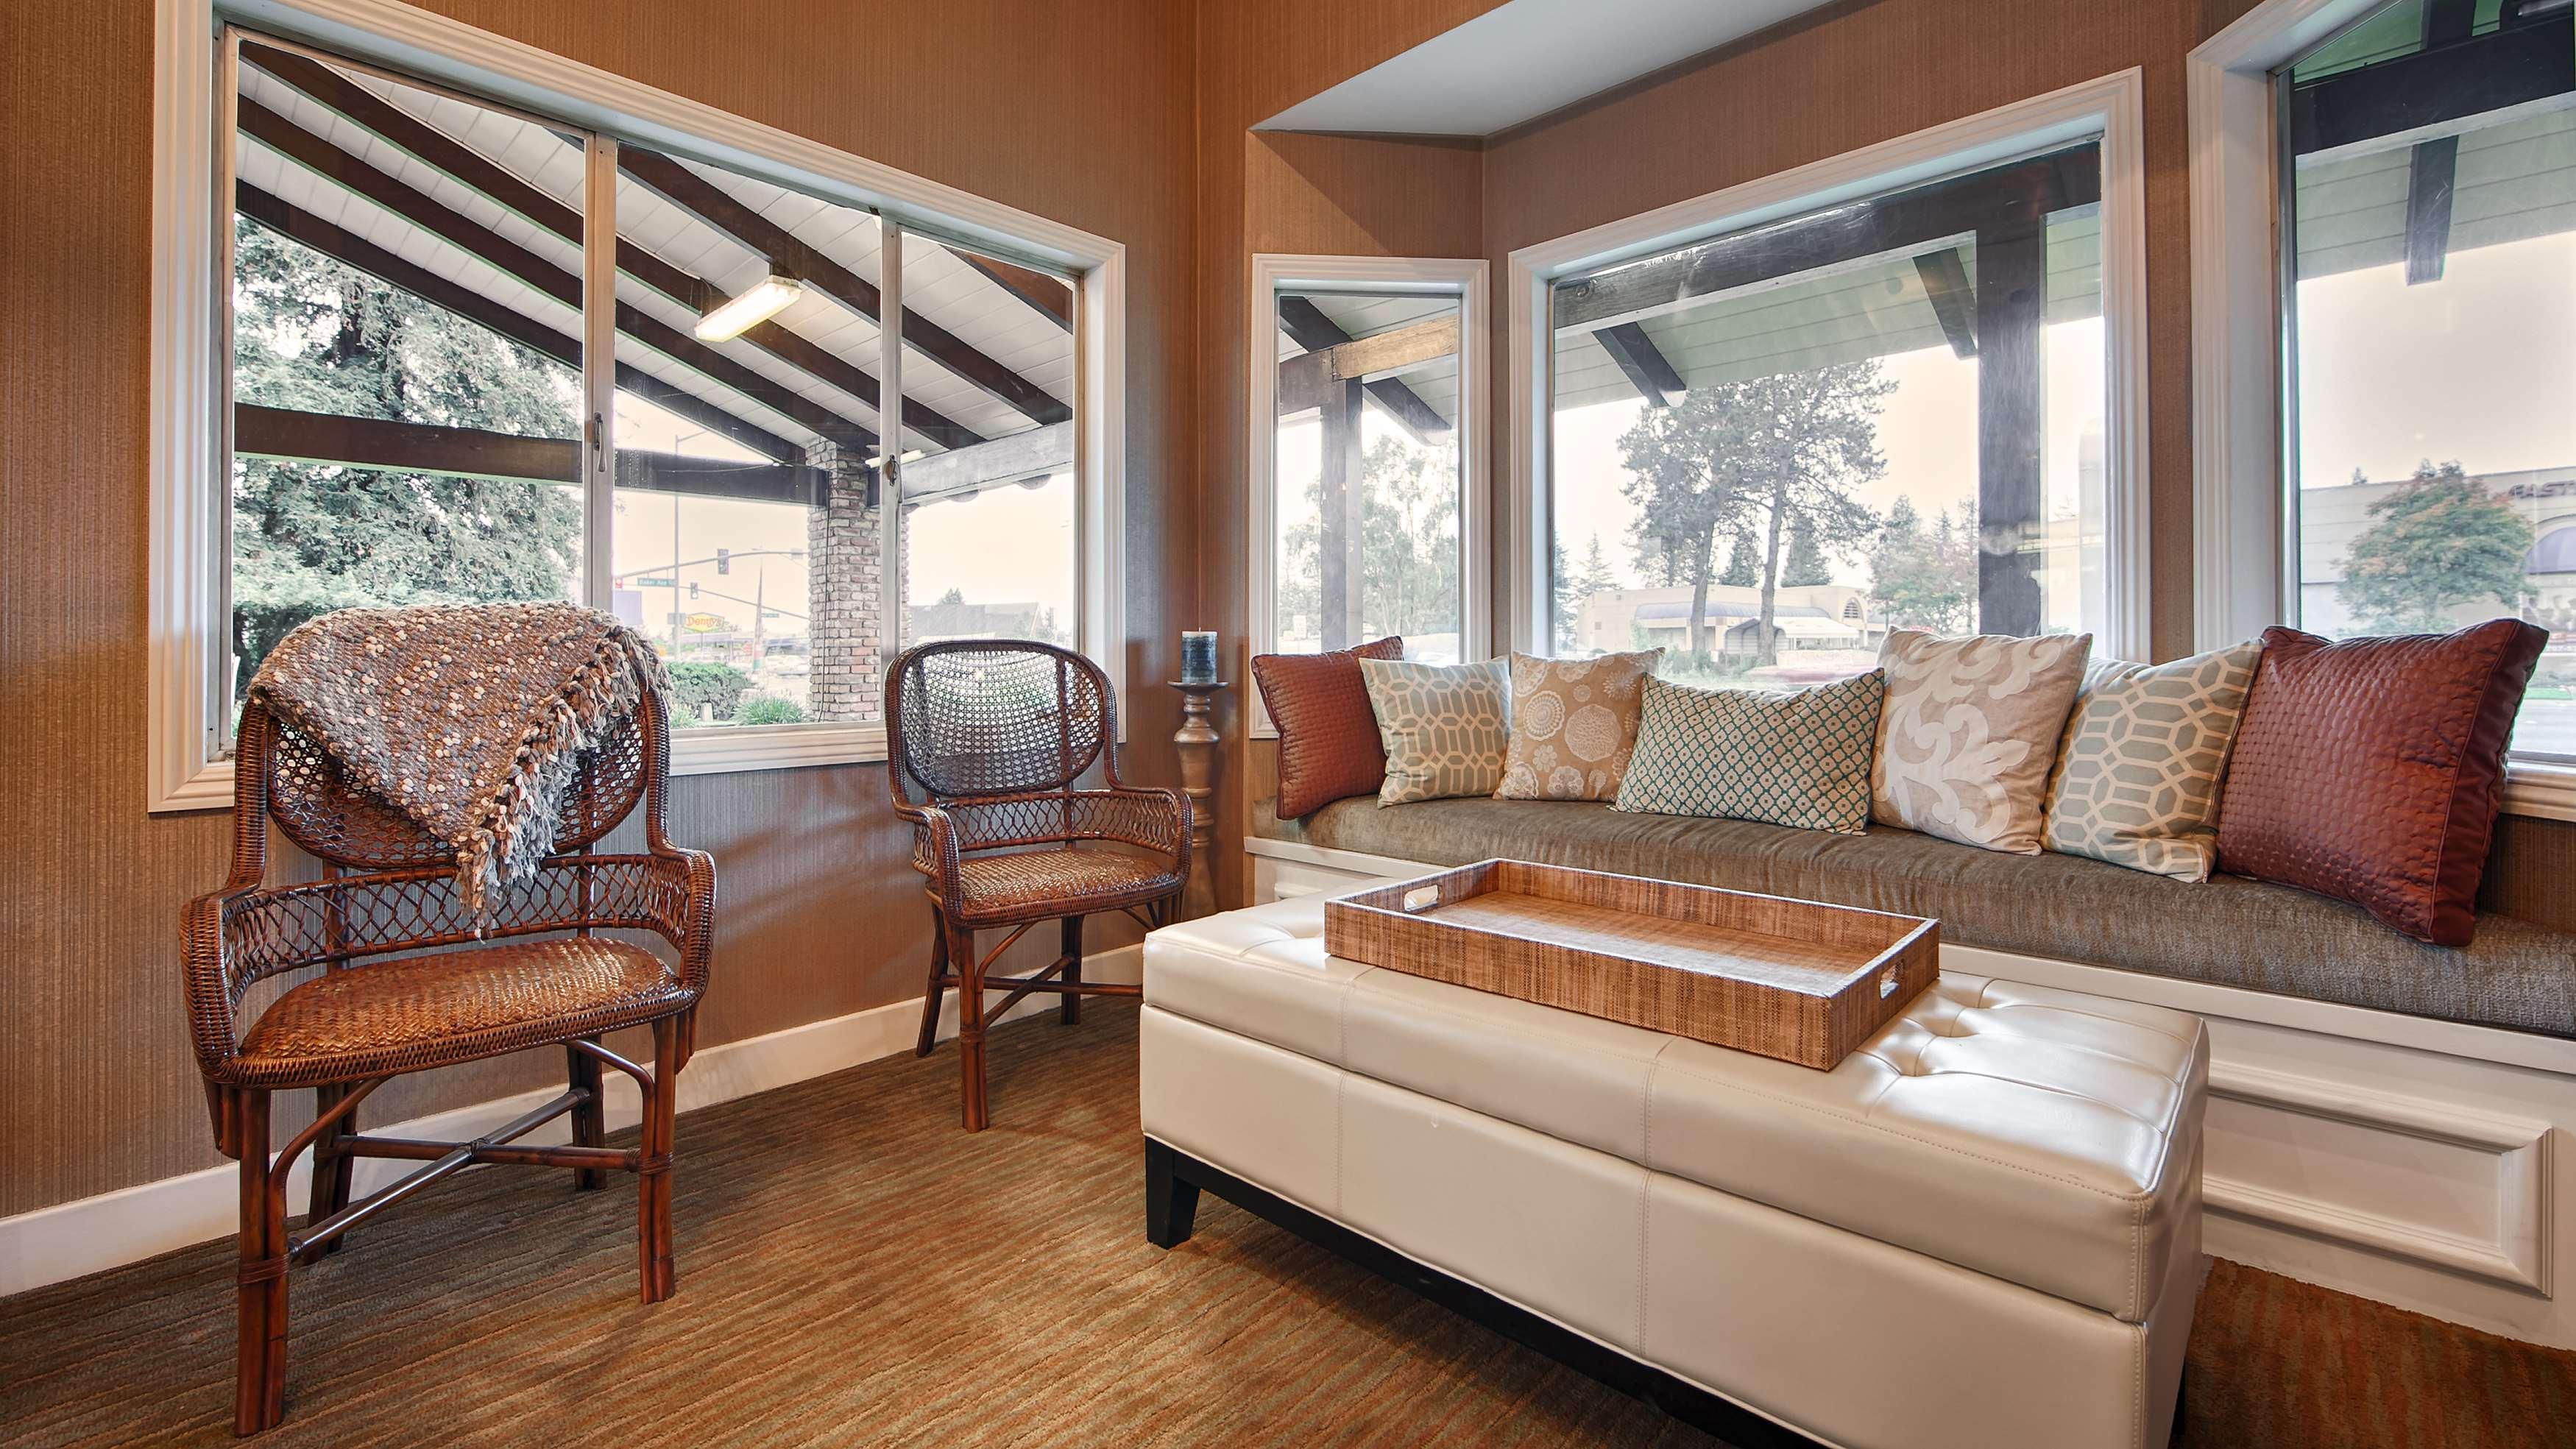 Best Western Garden Inn In Santa Rosa Ca 707 546 4